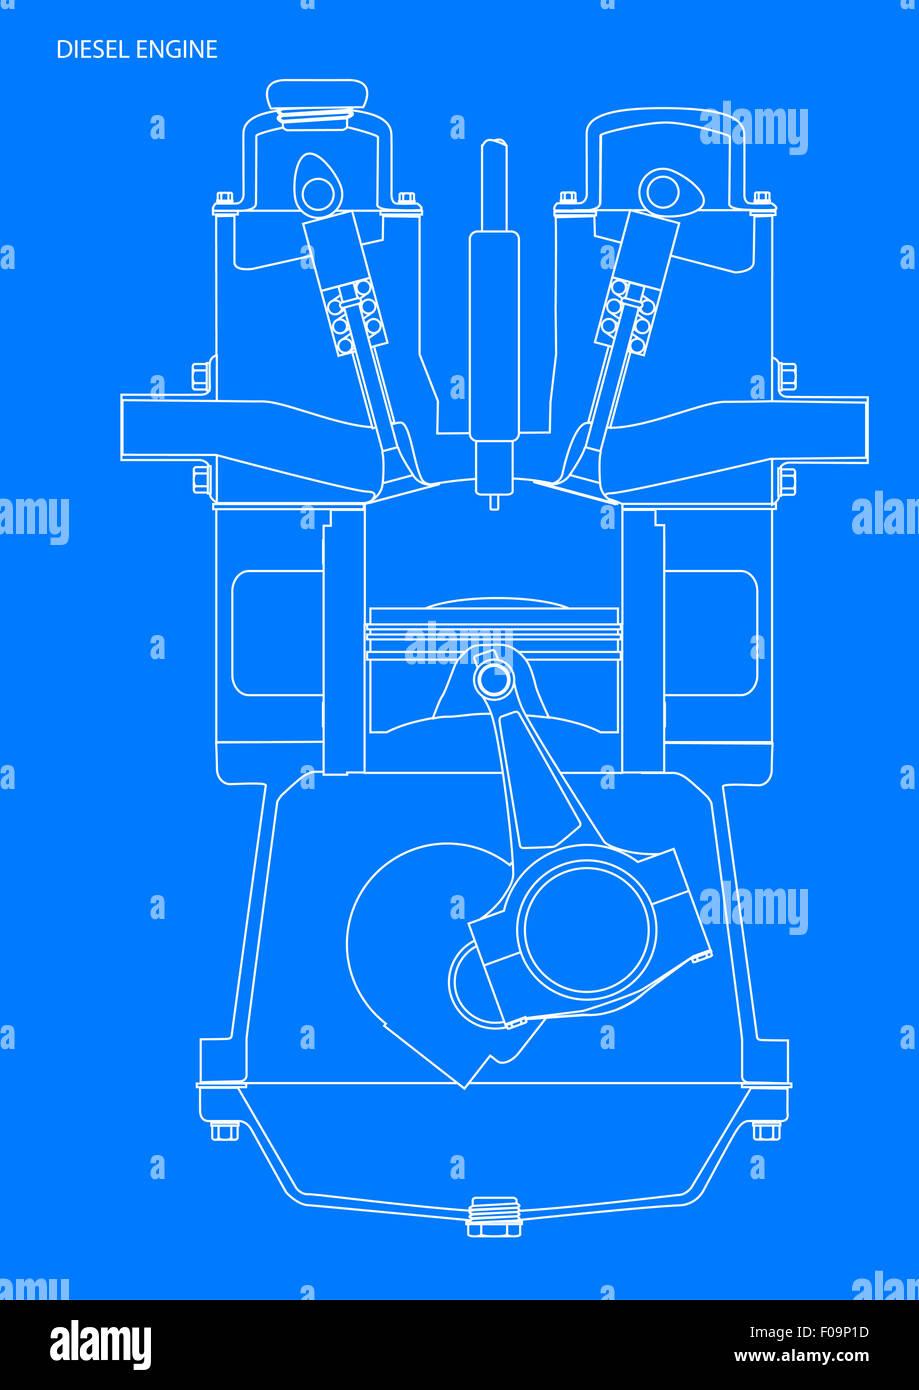 Charmant Dieselmotor Schaltplan Fotos - Elektrische Schaltplan-Ideen ...